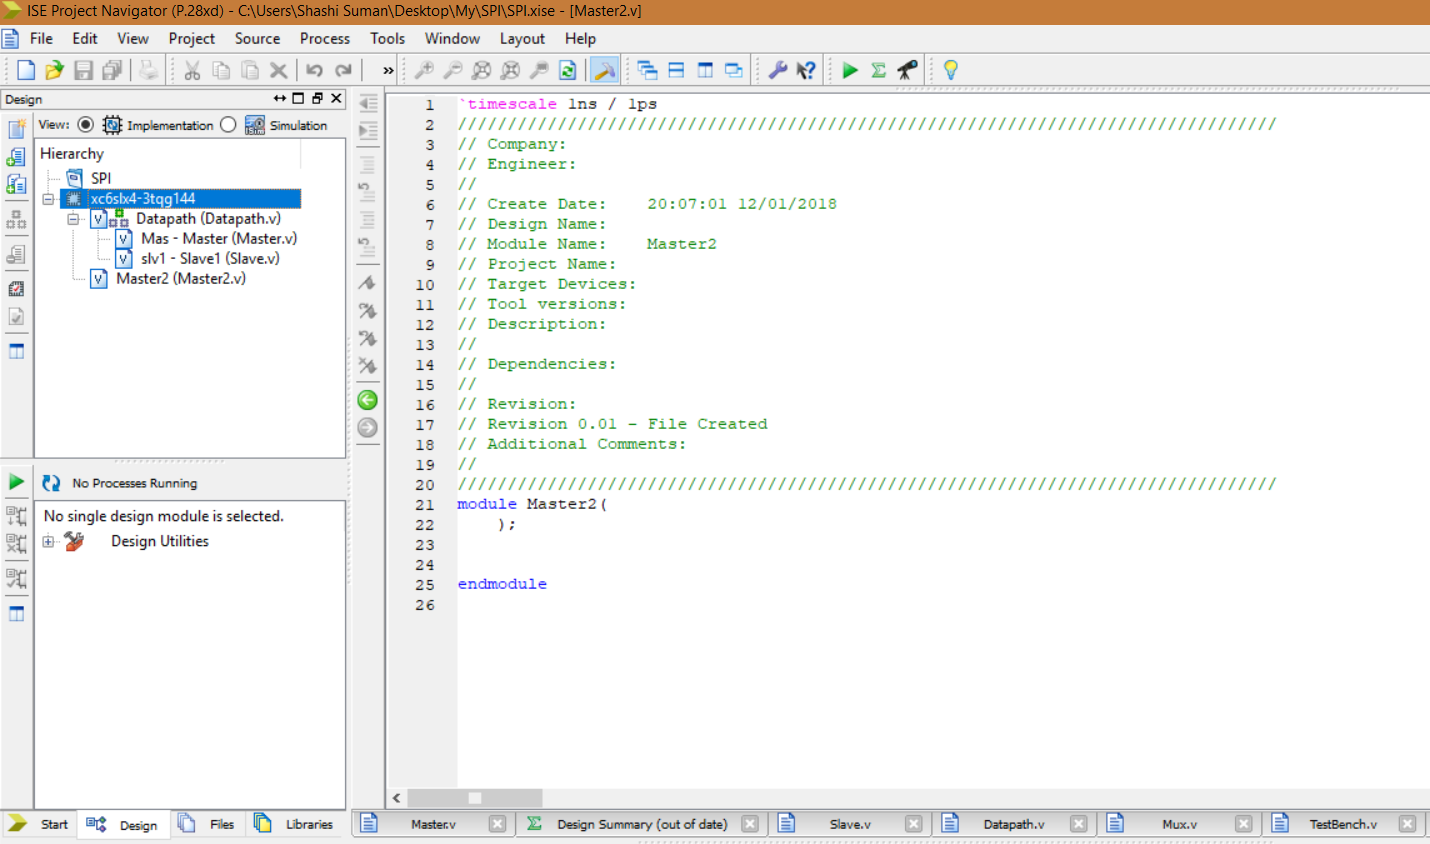 HelloCodings: Verilog simulation in Xilinx